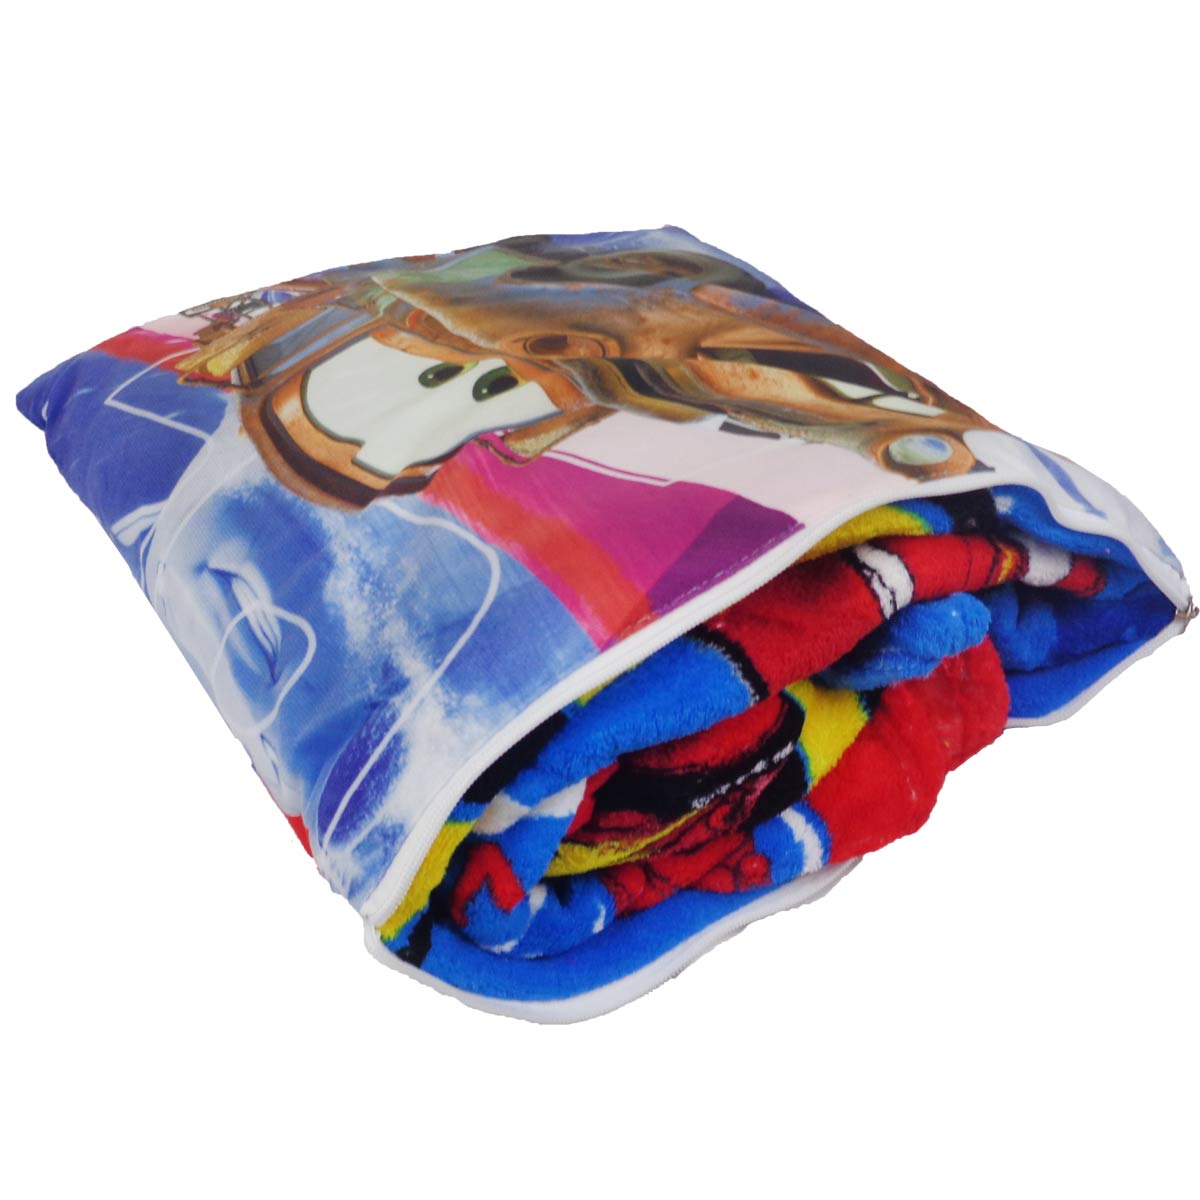 Manta Almofada Infantil Carros Azul Menino Microfibra Jolitex